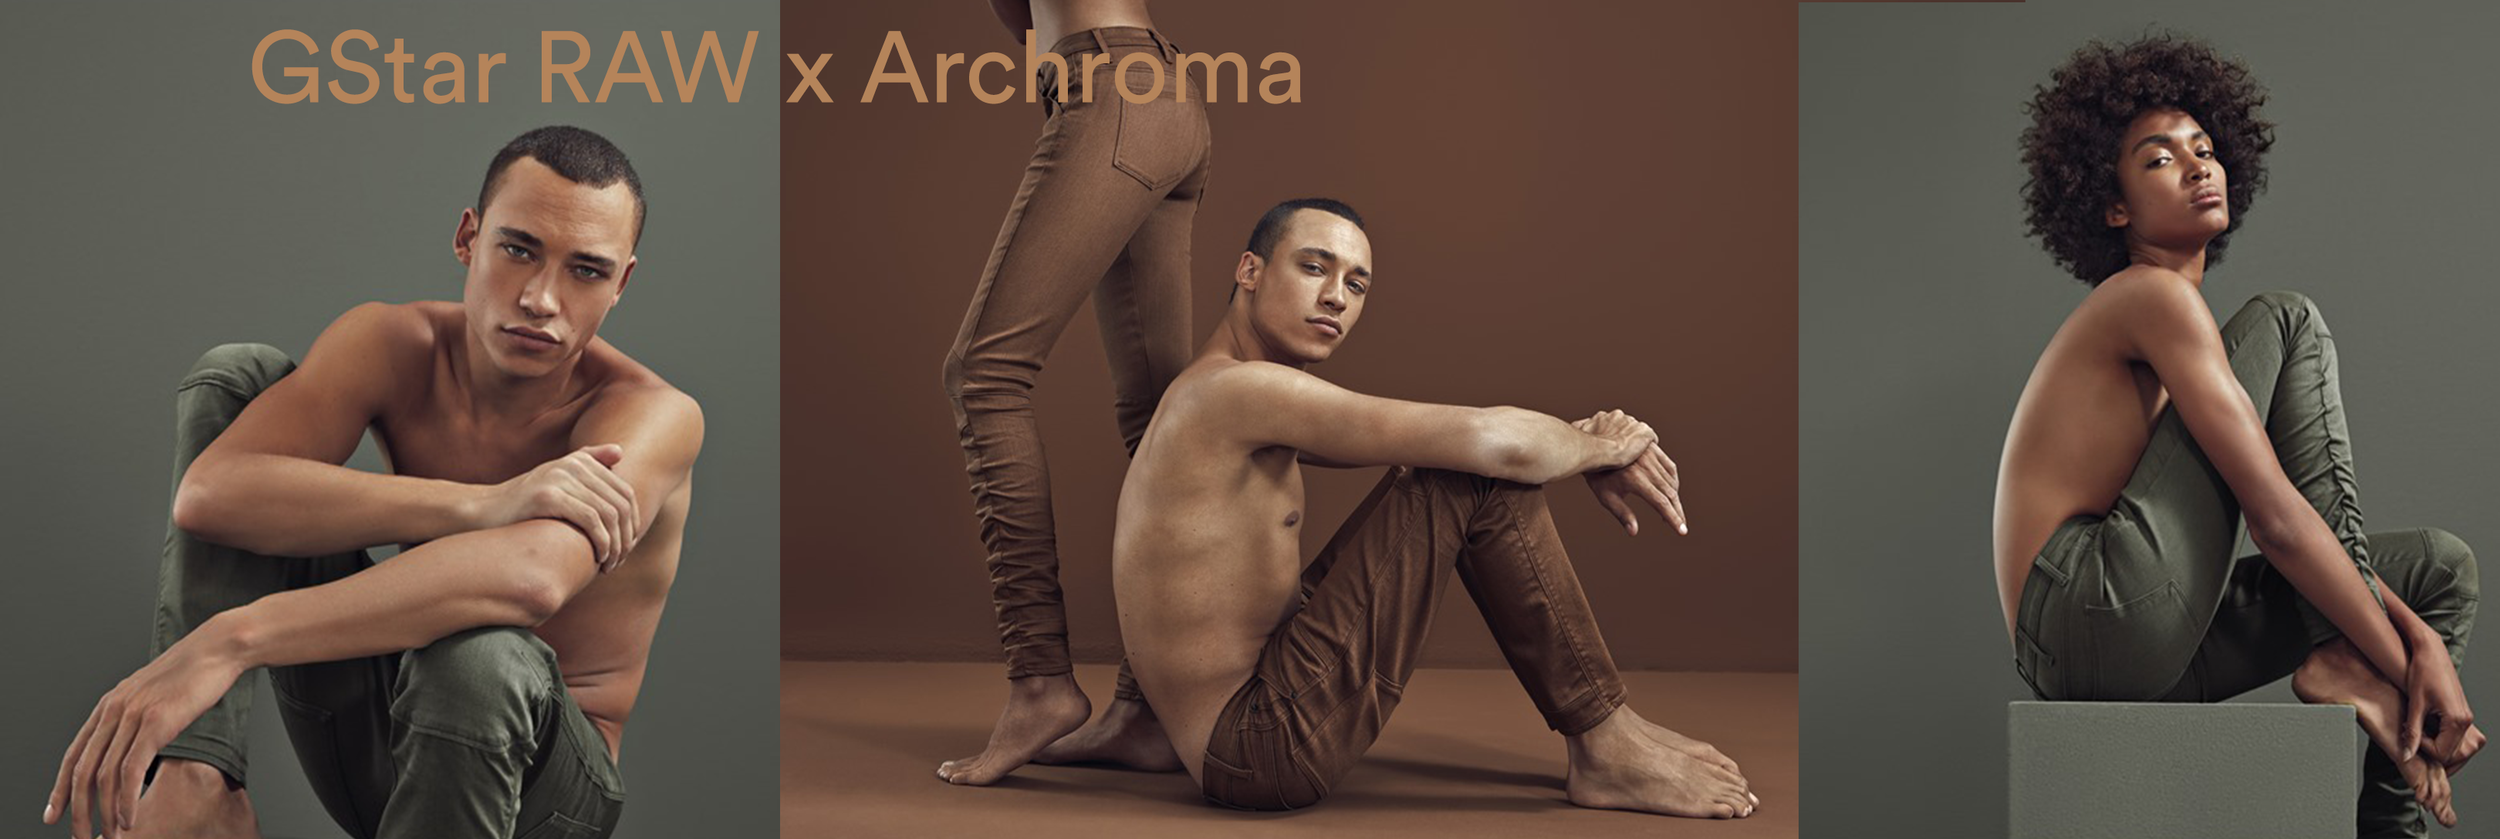 GStar X Archroma